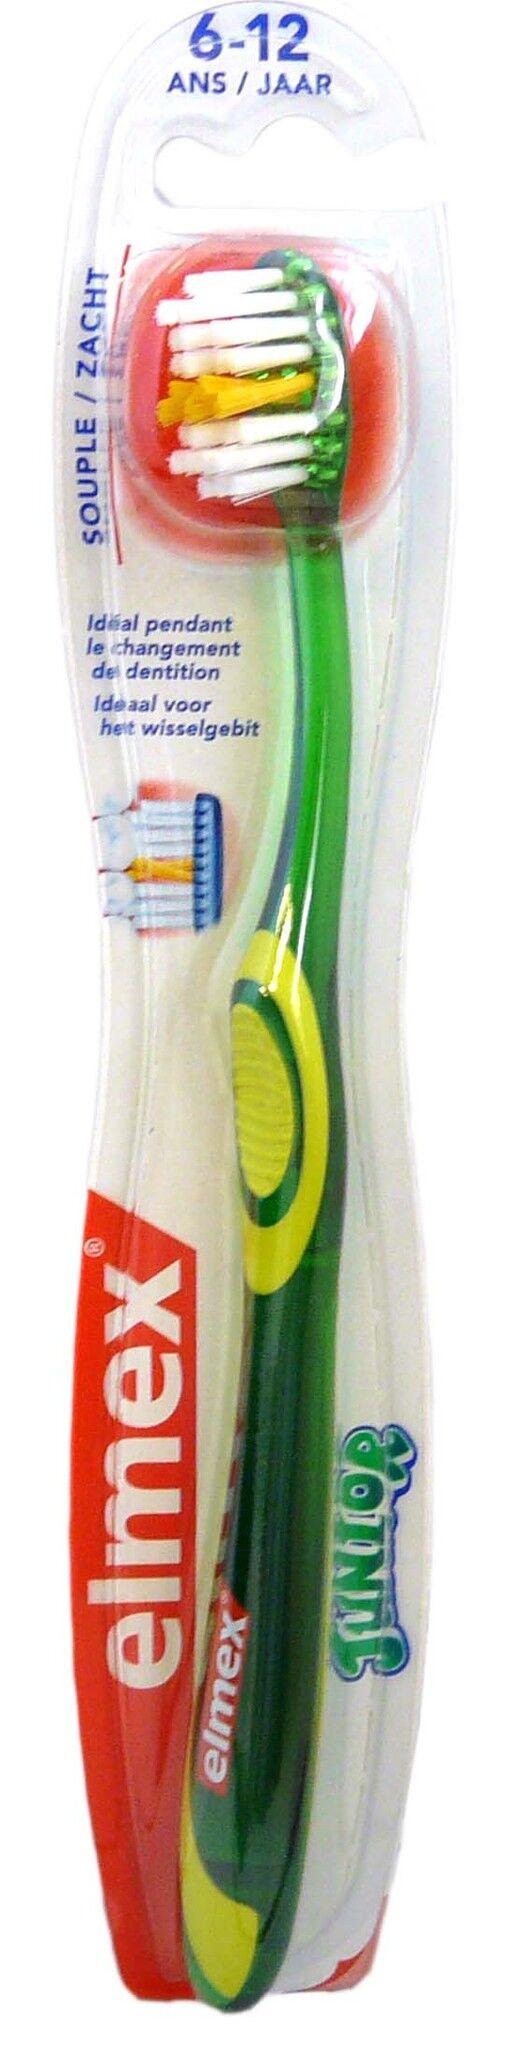 Elmex brosse a dents junior souple